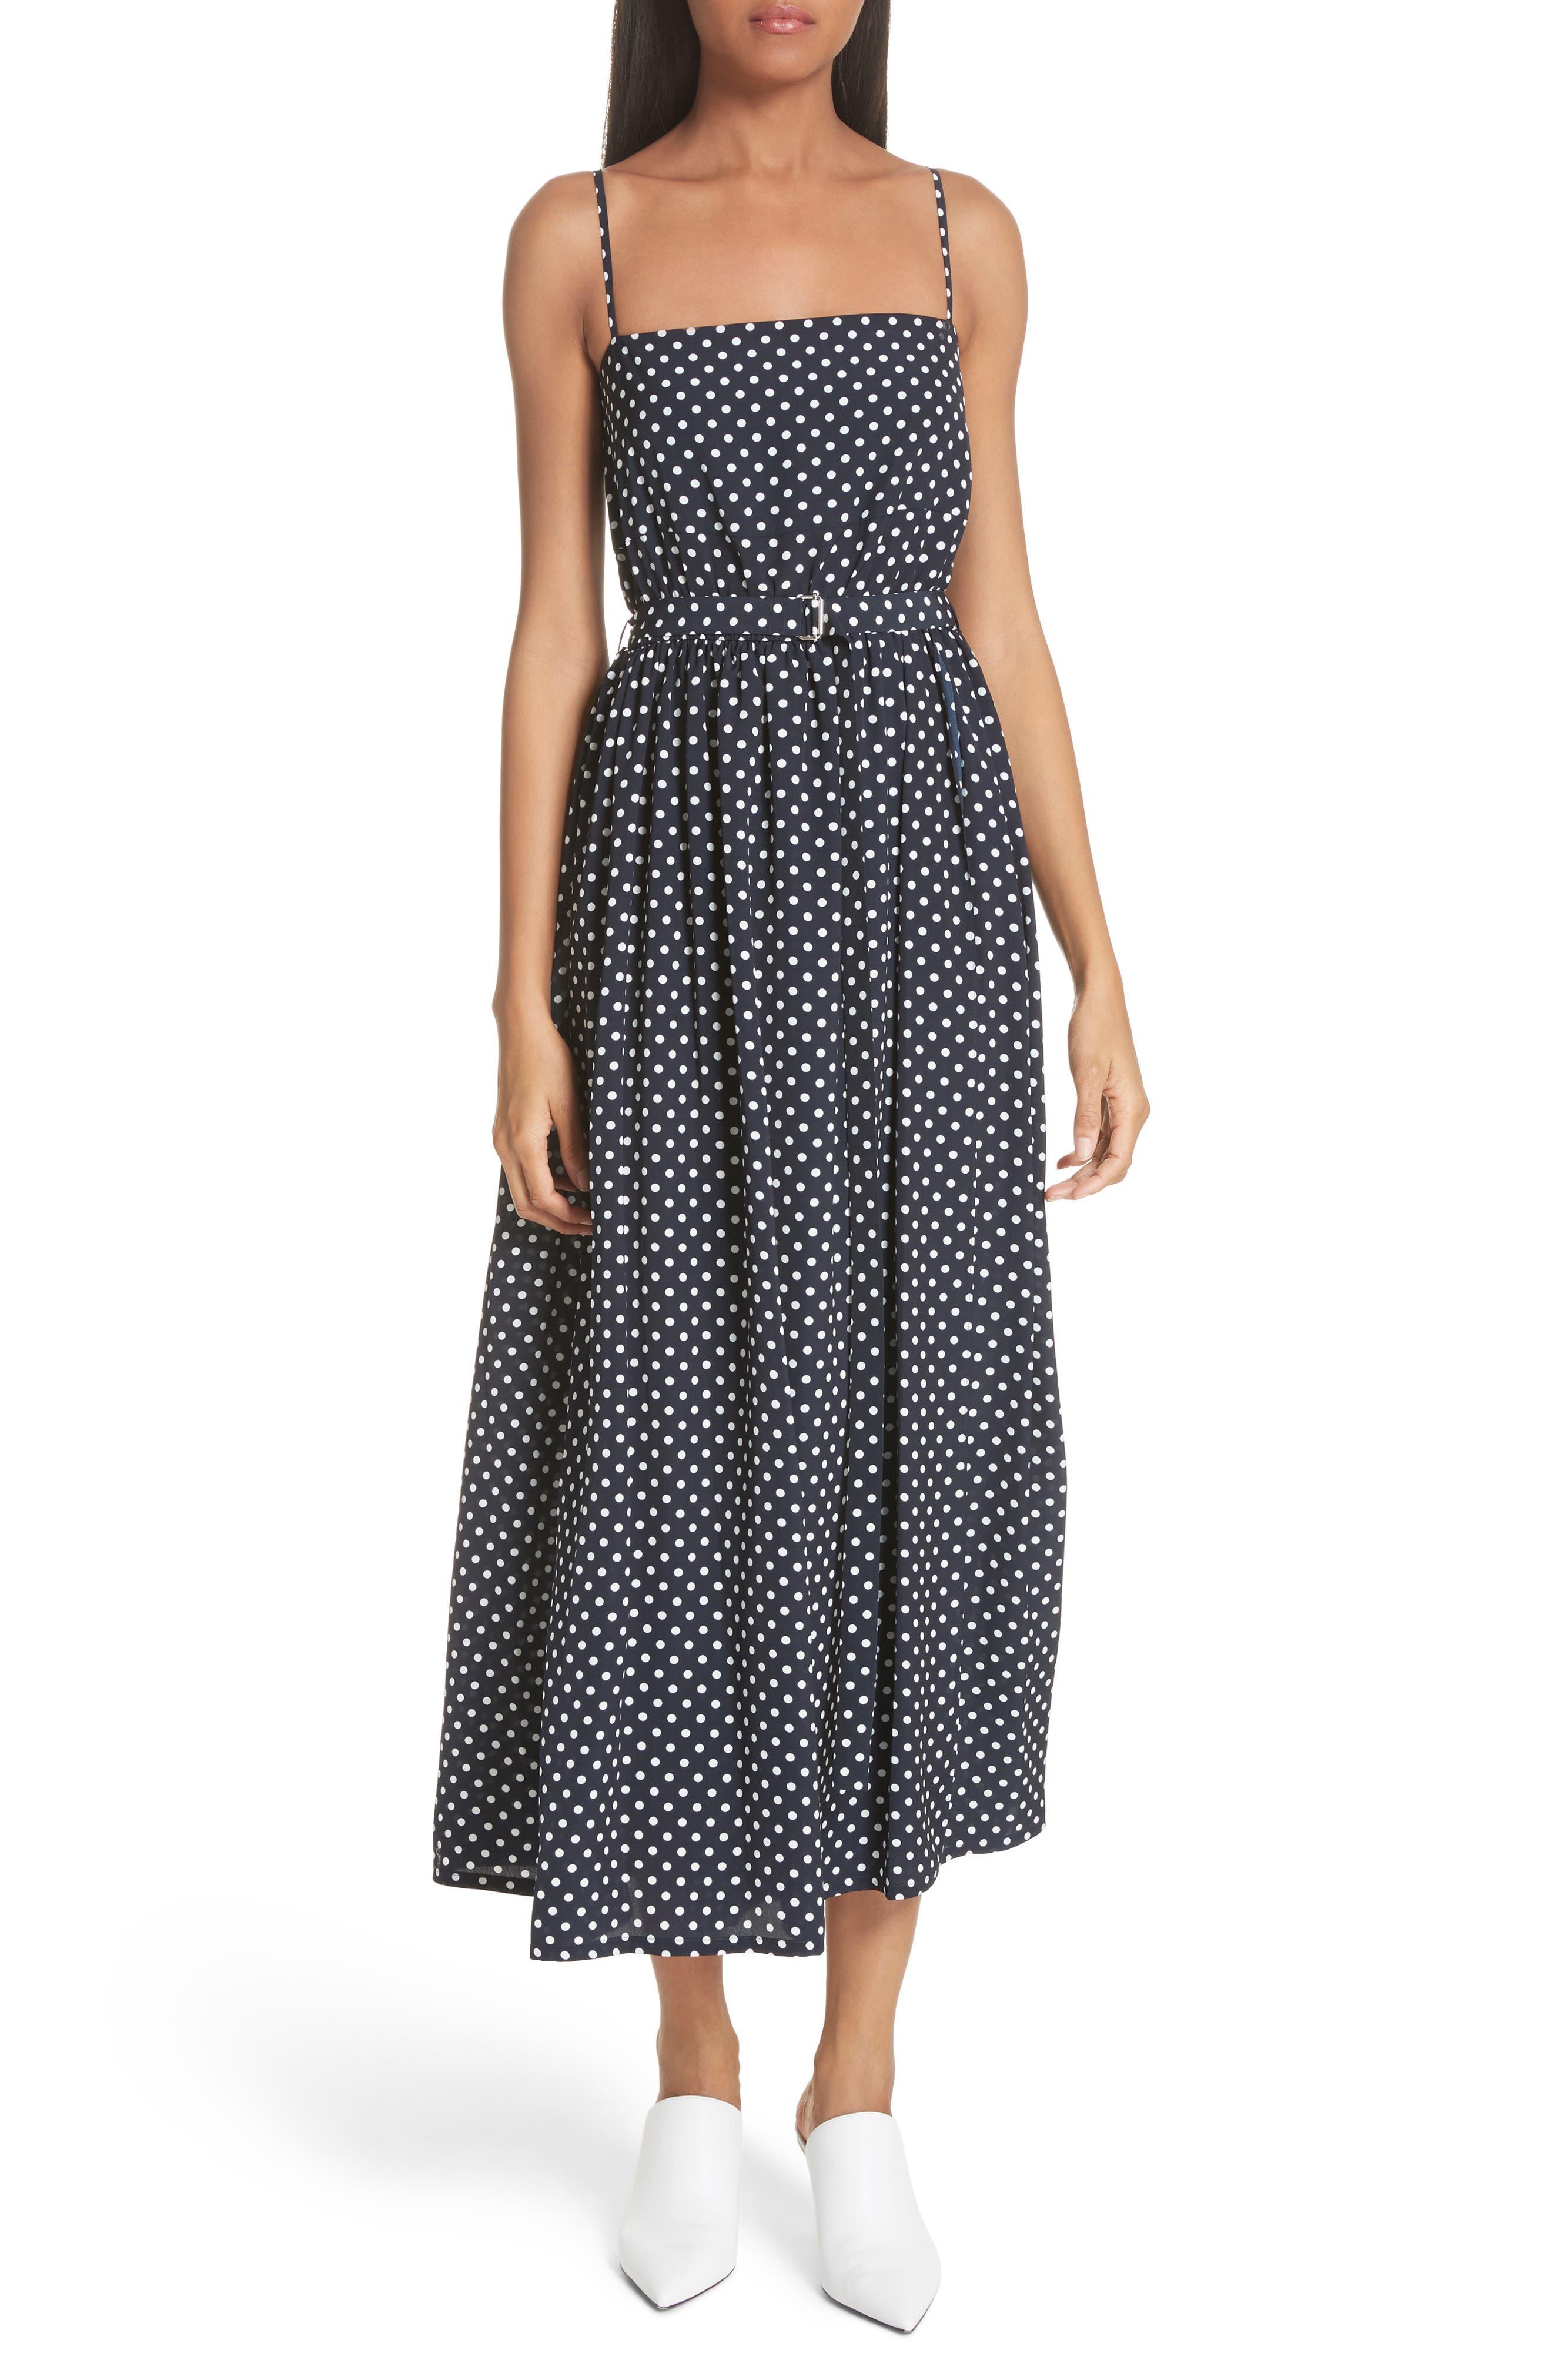 Polka Dot Midi Dress,                         Main,                         color, Navy